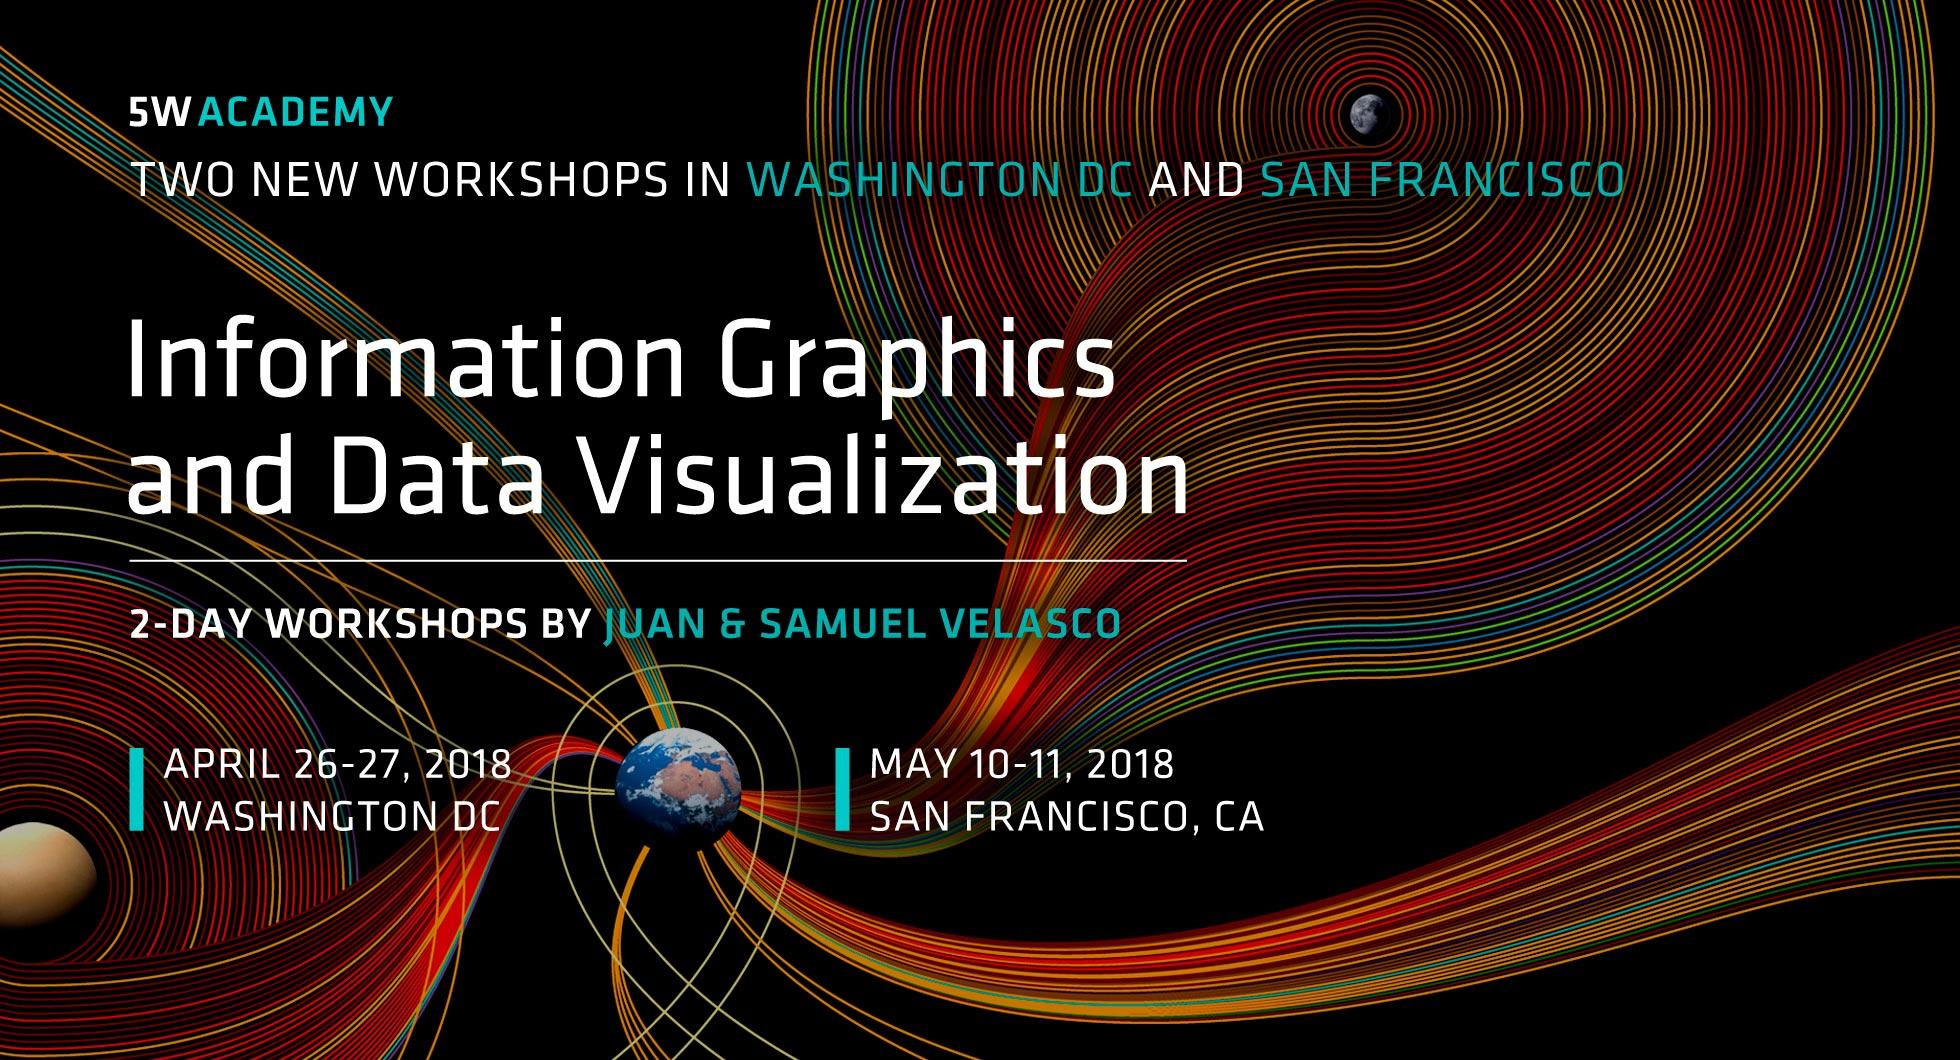 New 5W Academy workshops in Washington and San Francisco